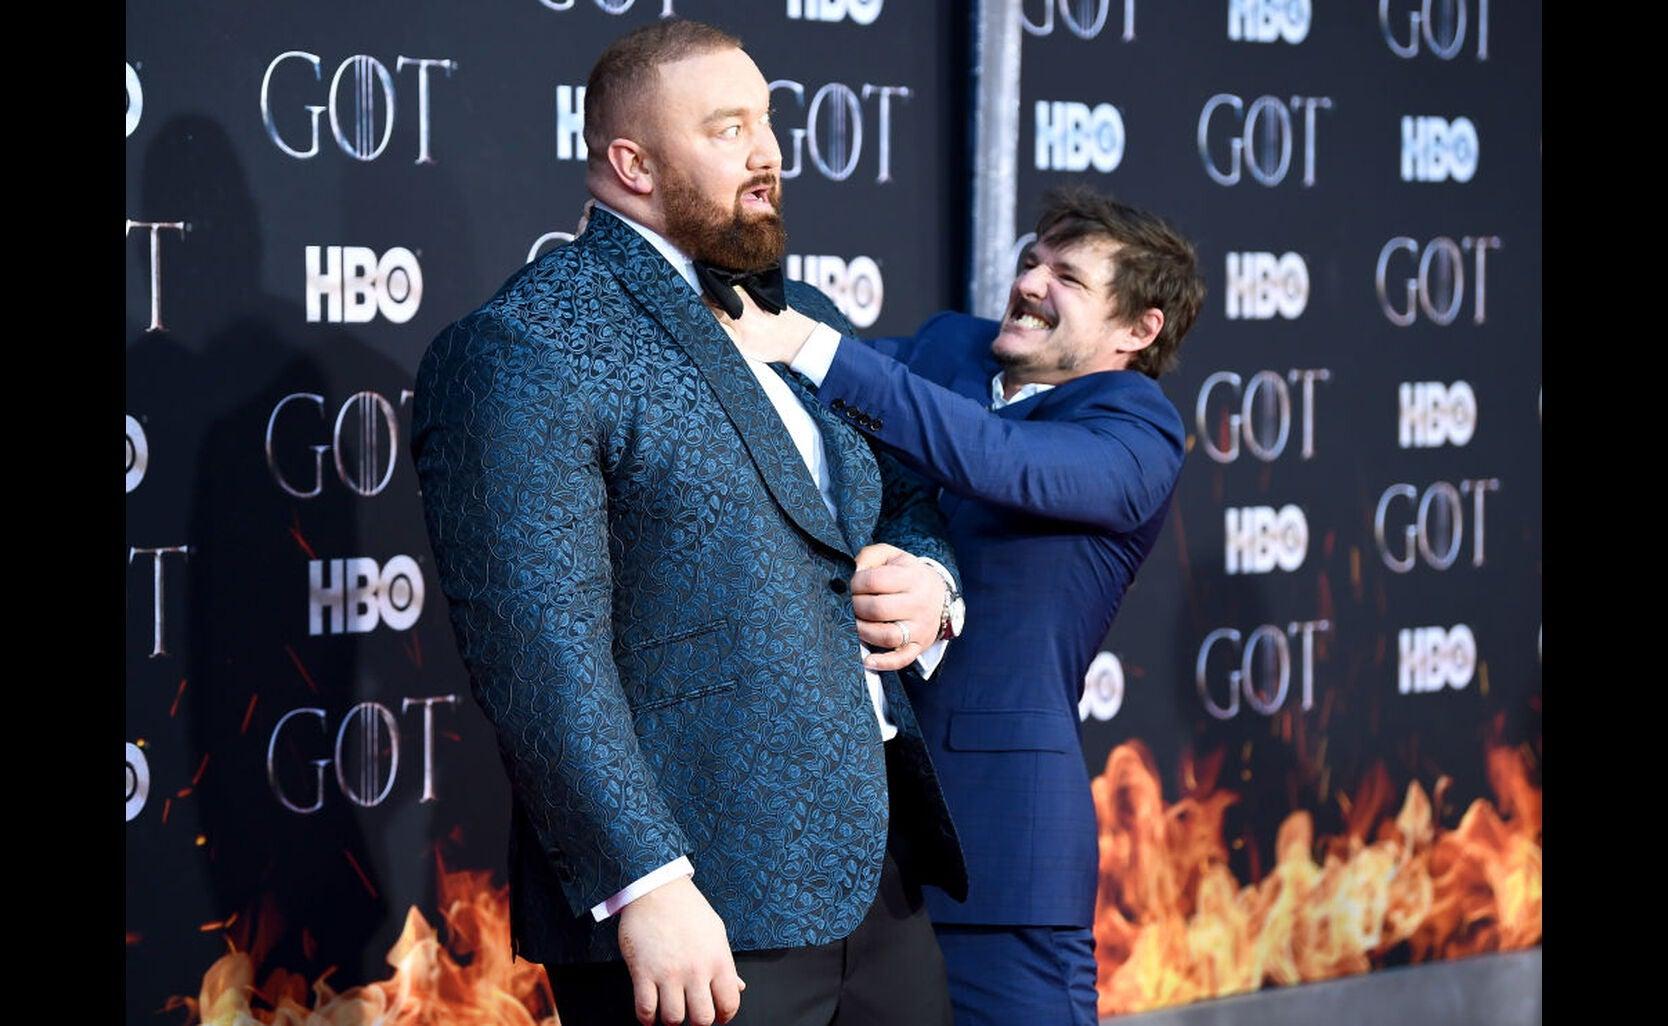 Hafþór Júlíus Björnsson at the premiere of s8 of Game of Thrones